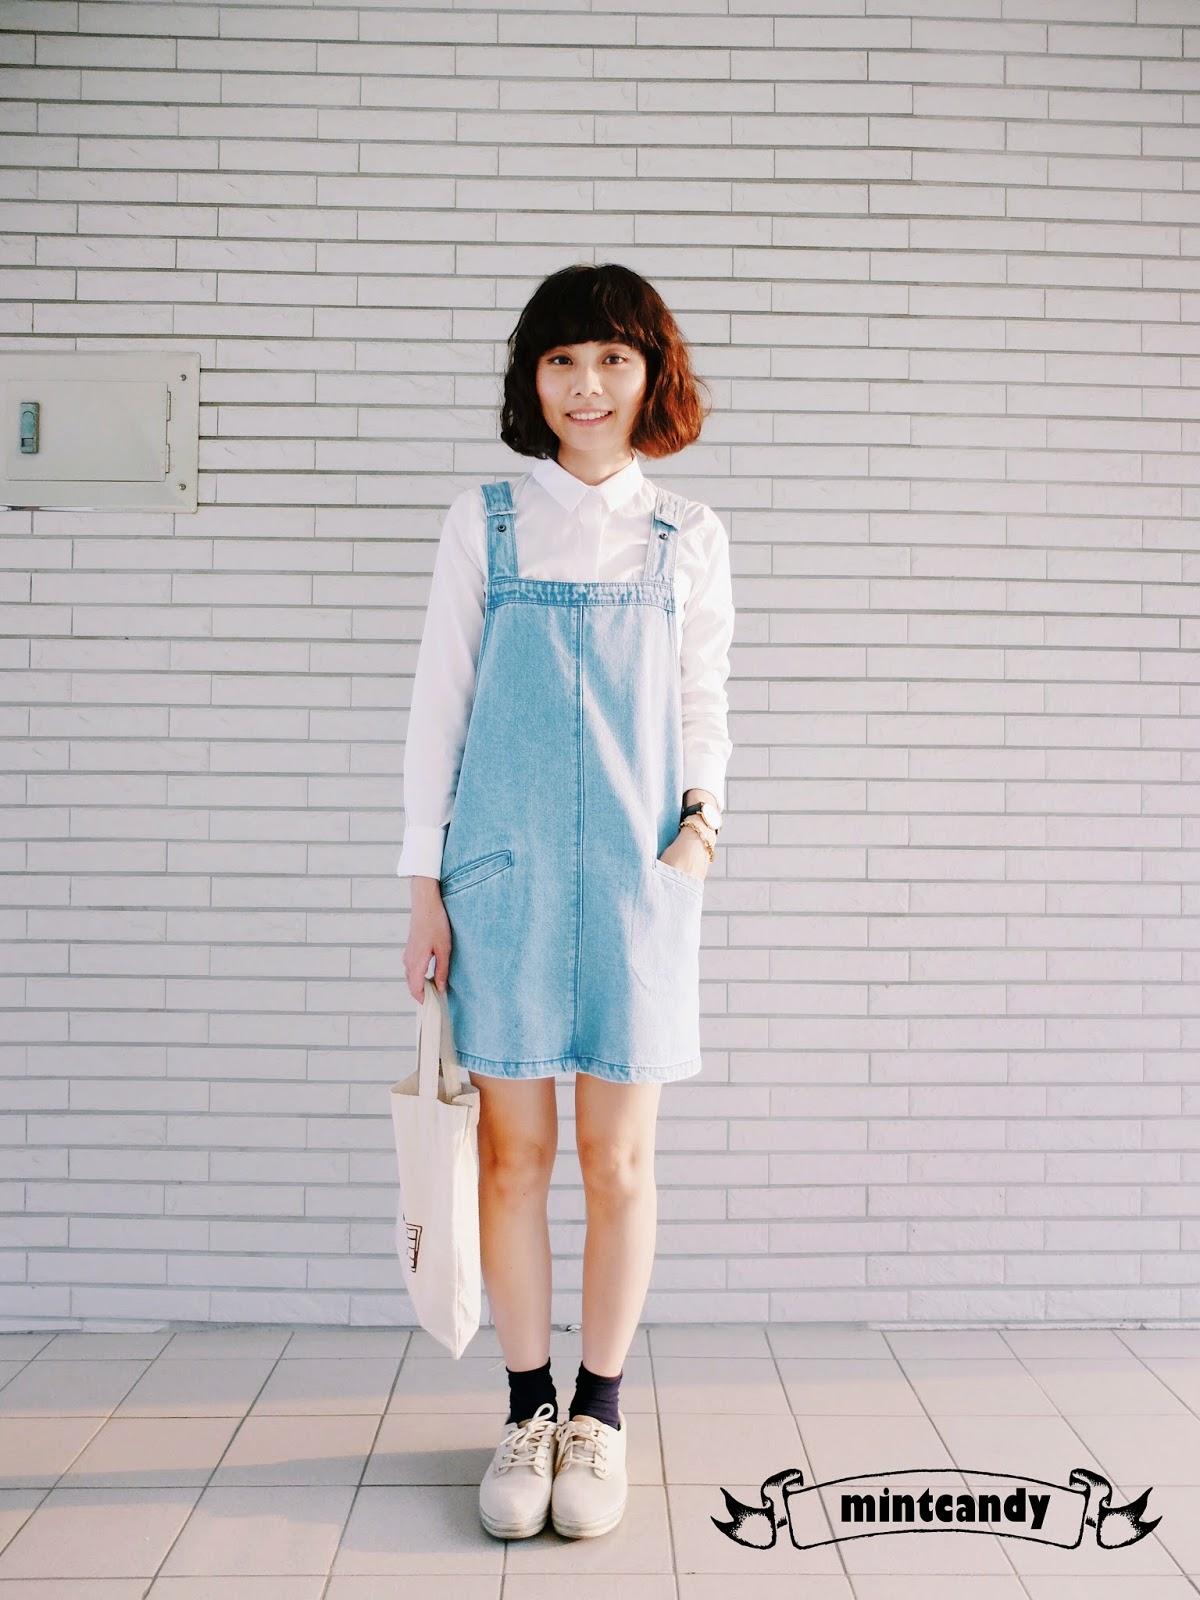 mintcandy: 穿│正式白襯衫的不正式穿搭